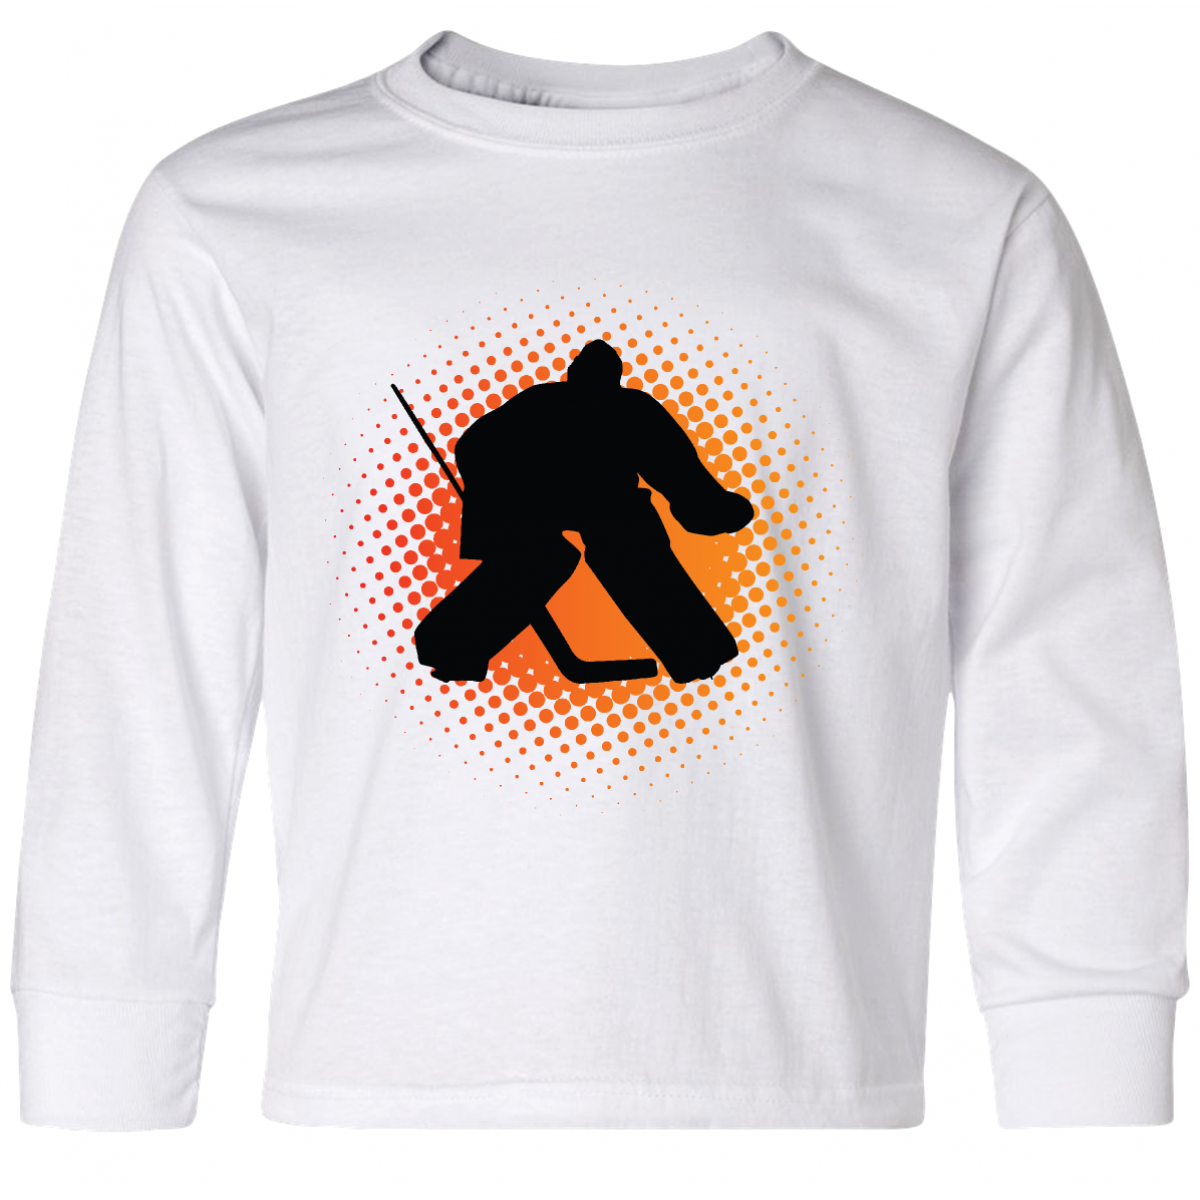 20c02ab4d Ice Hockey Goalie Sports Youth Long Sleeve T-Shirt White  17.99  www.customhockeytshirts.